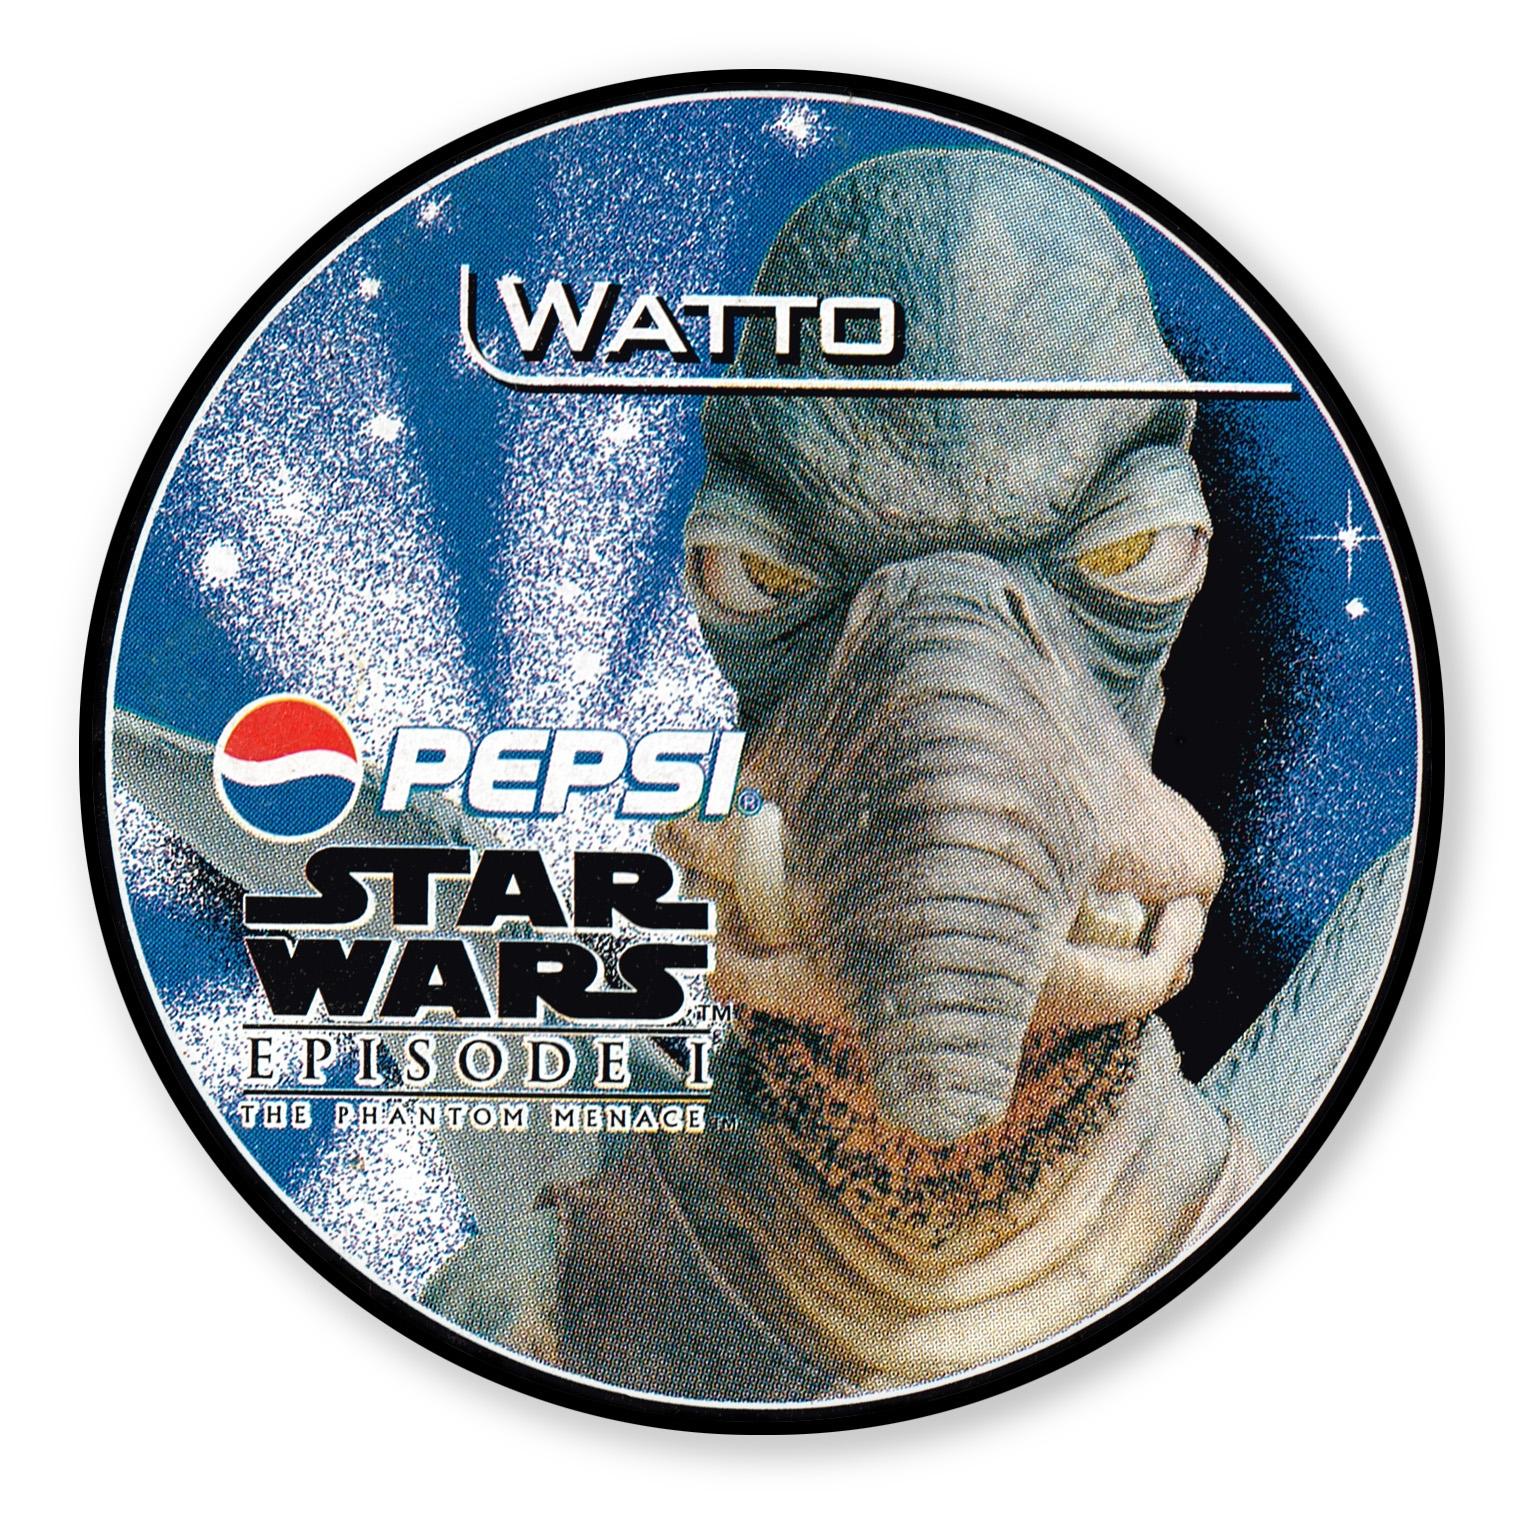 Watto Pepsi card (NZ, 1999)